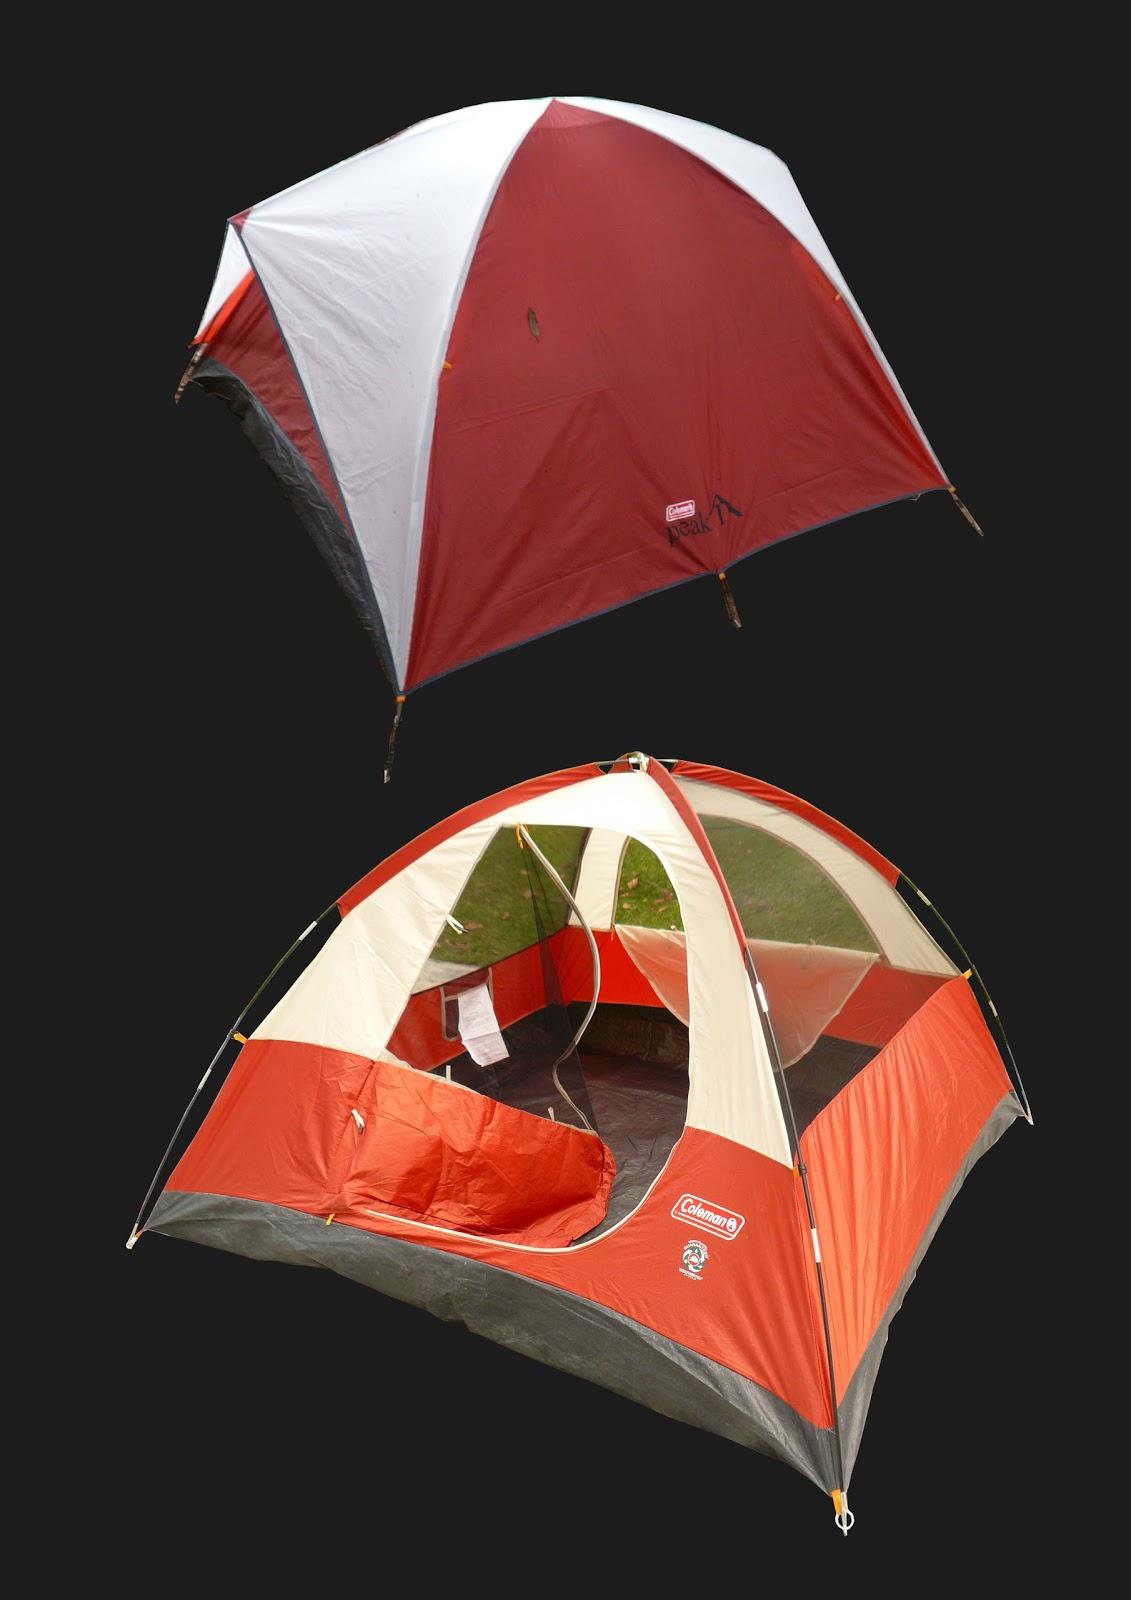 Coleman Tent & Outdoor Adventure Malaysia: Coleman Tent